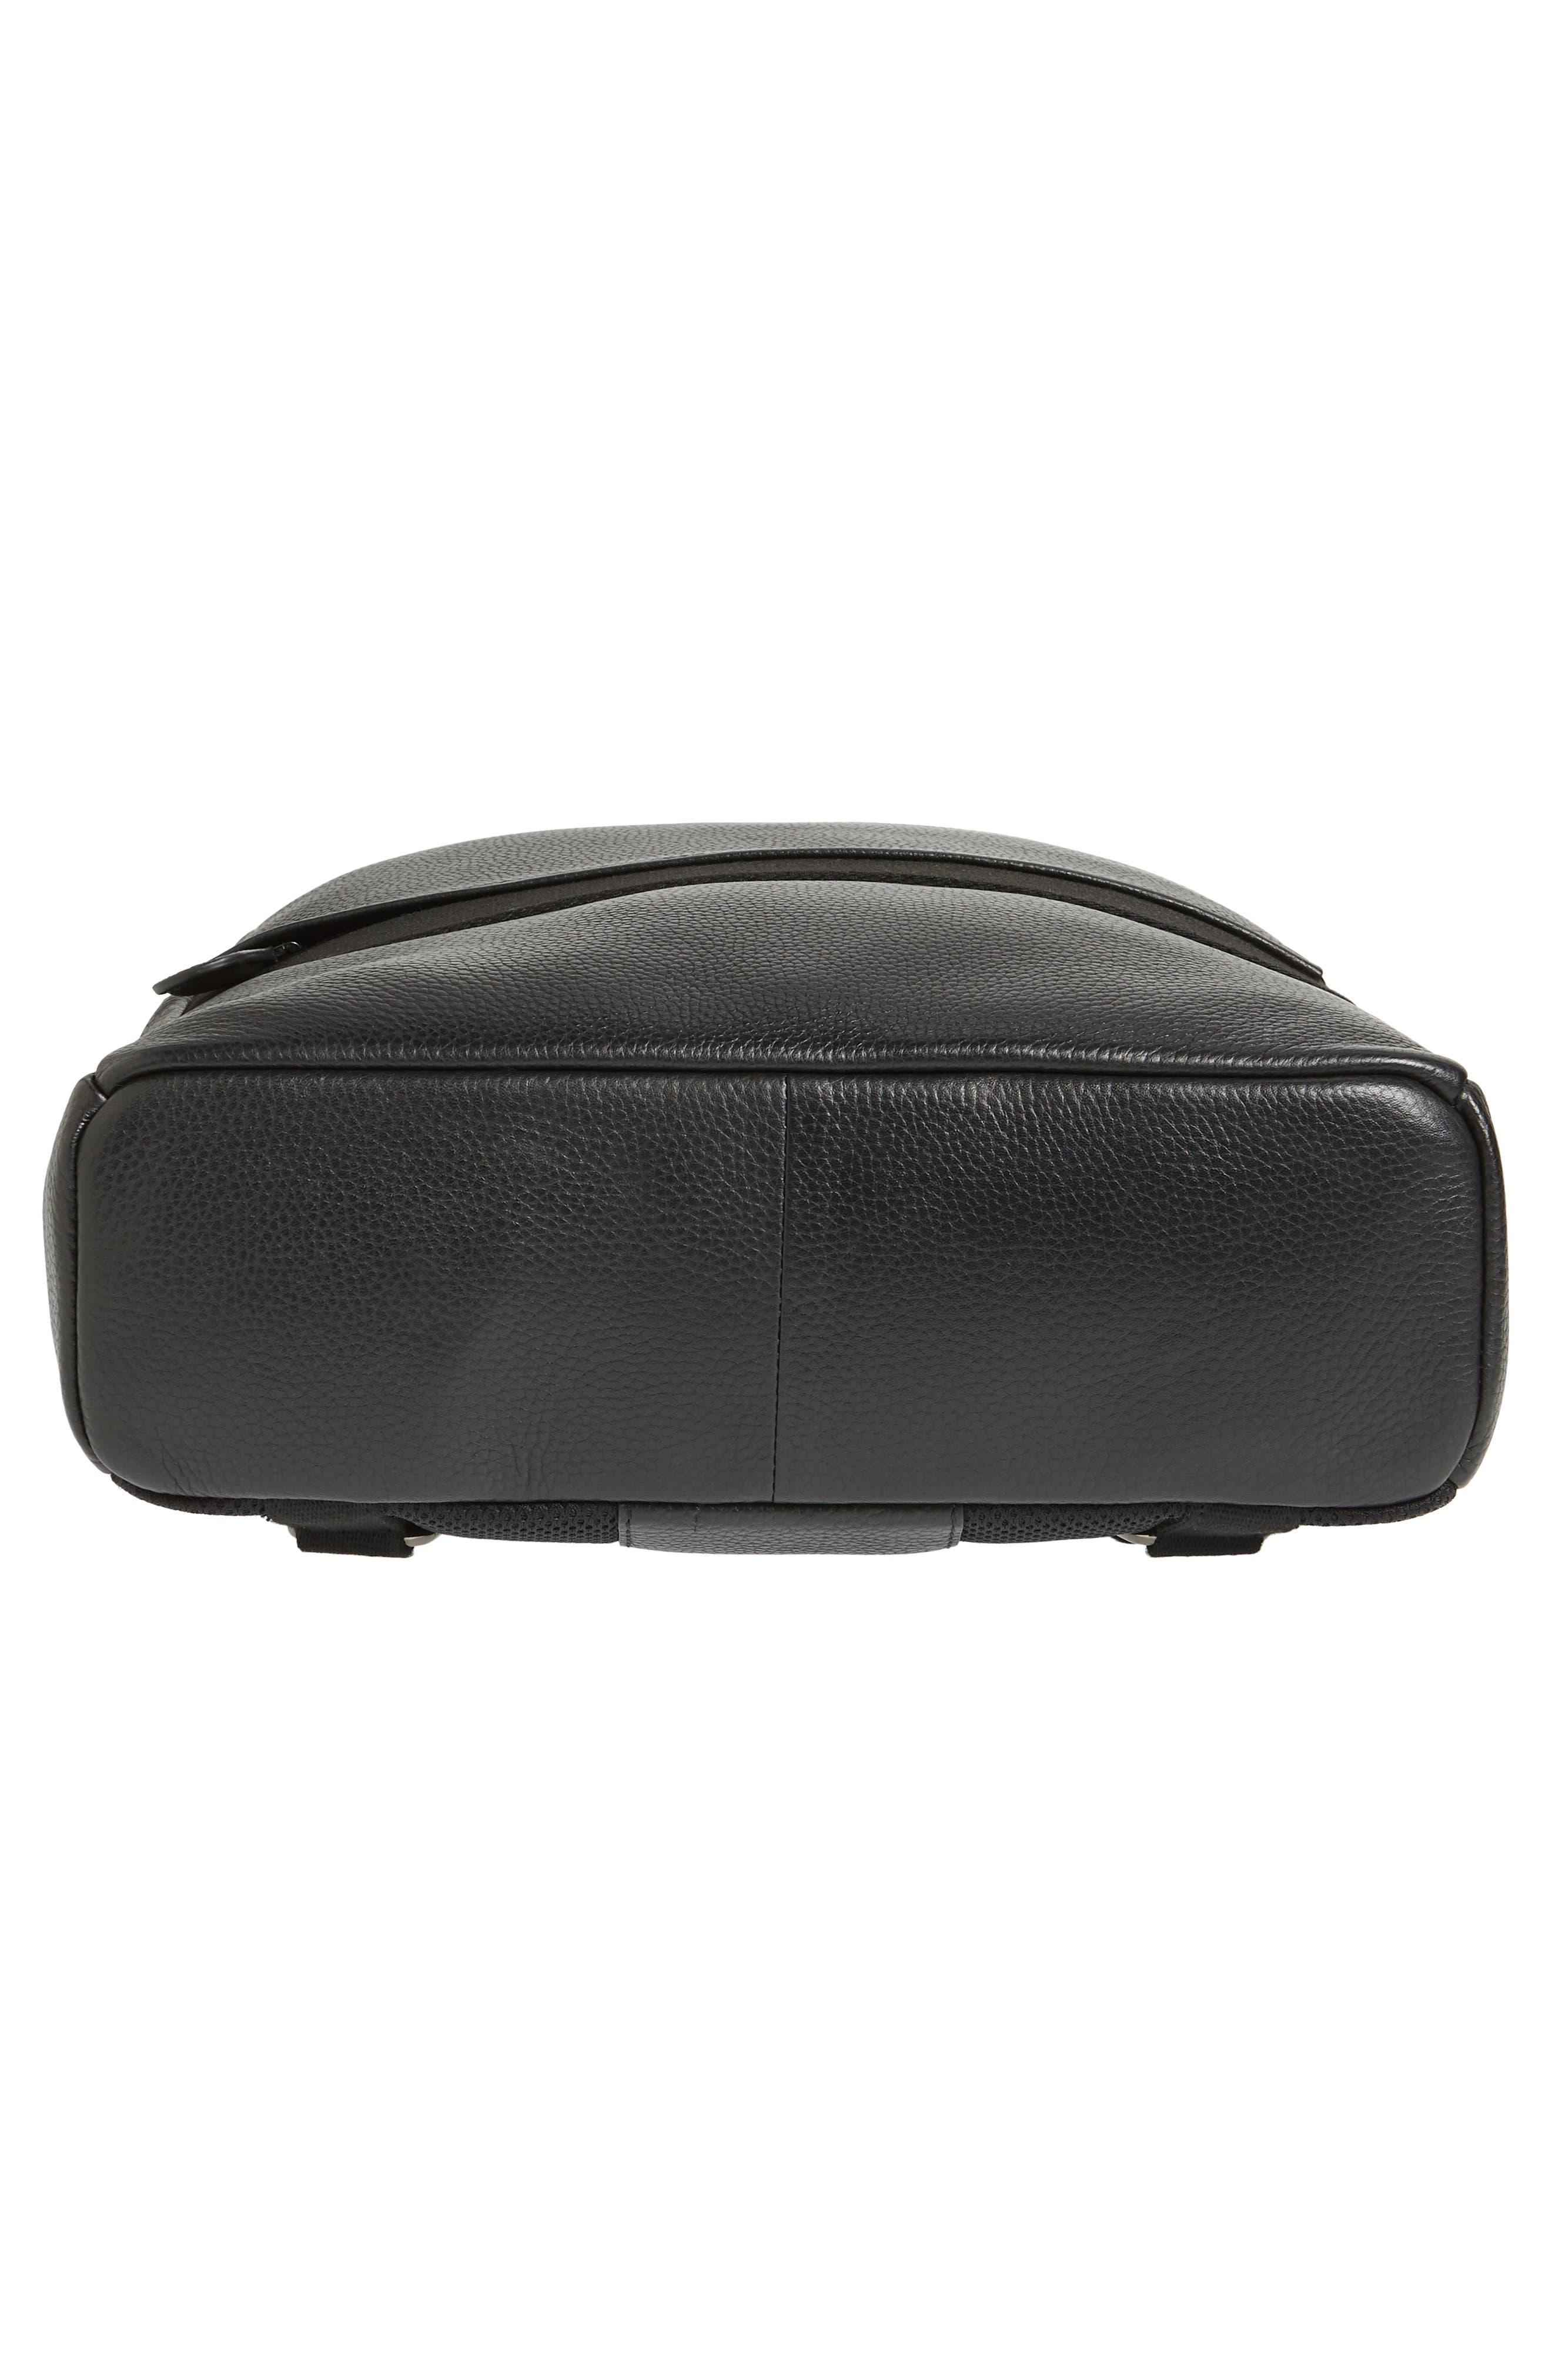 Rickrak Leather Backpack,                             Alternate thumbnail 6, color,                             BLACK